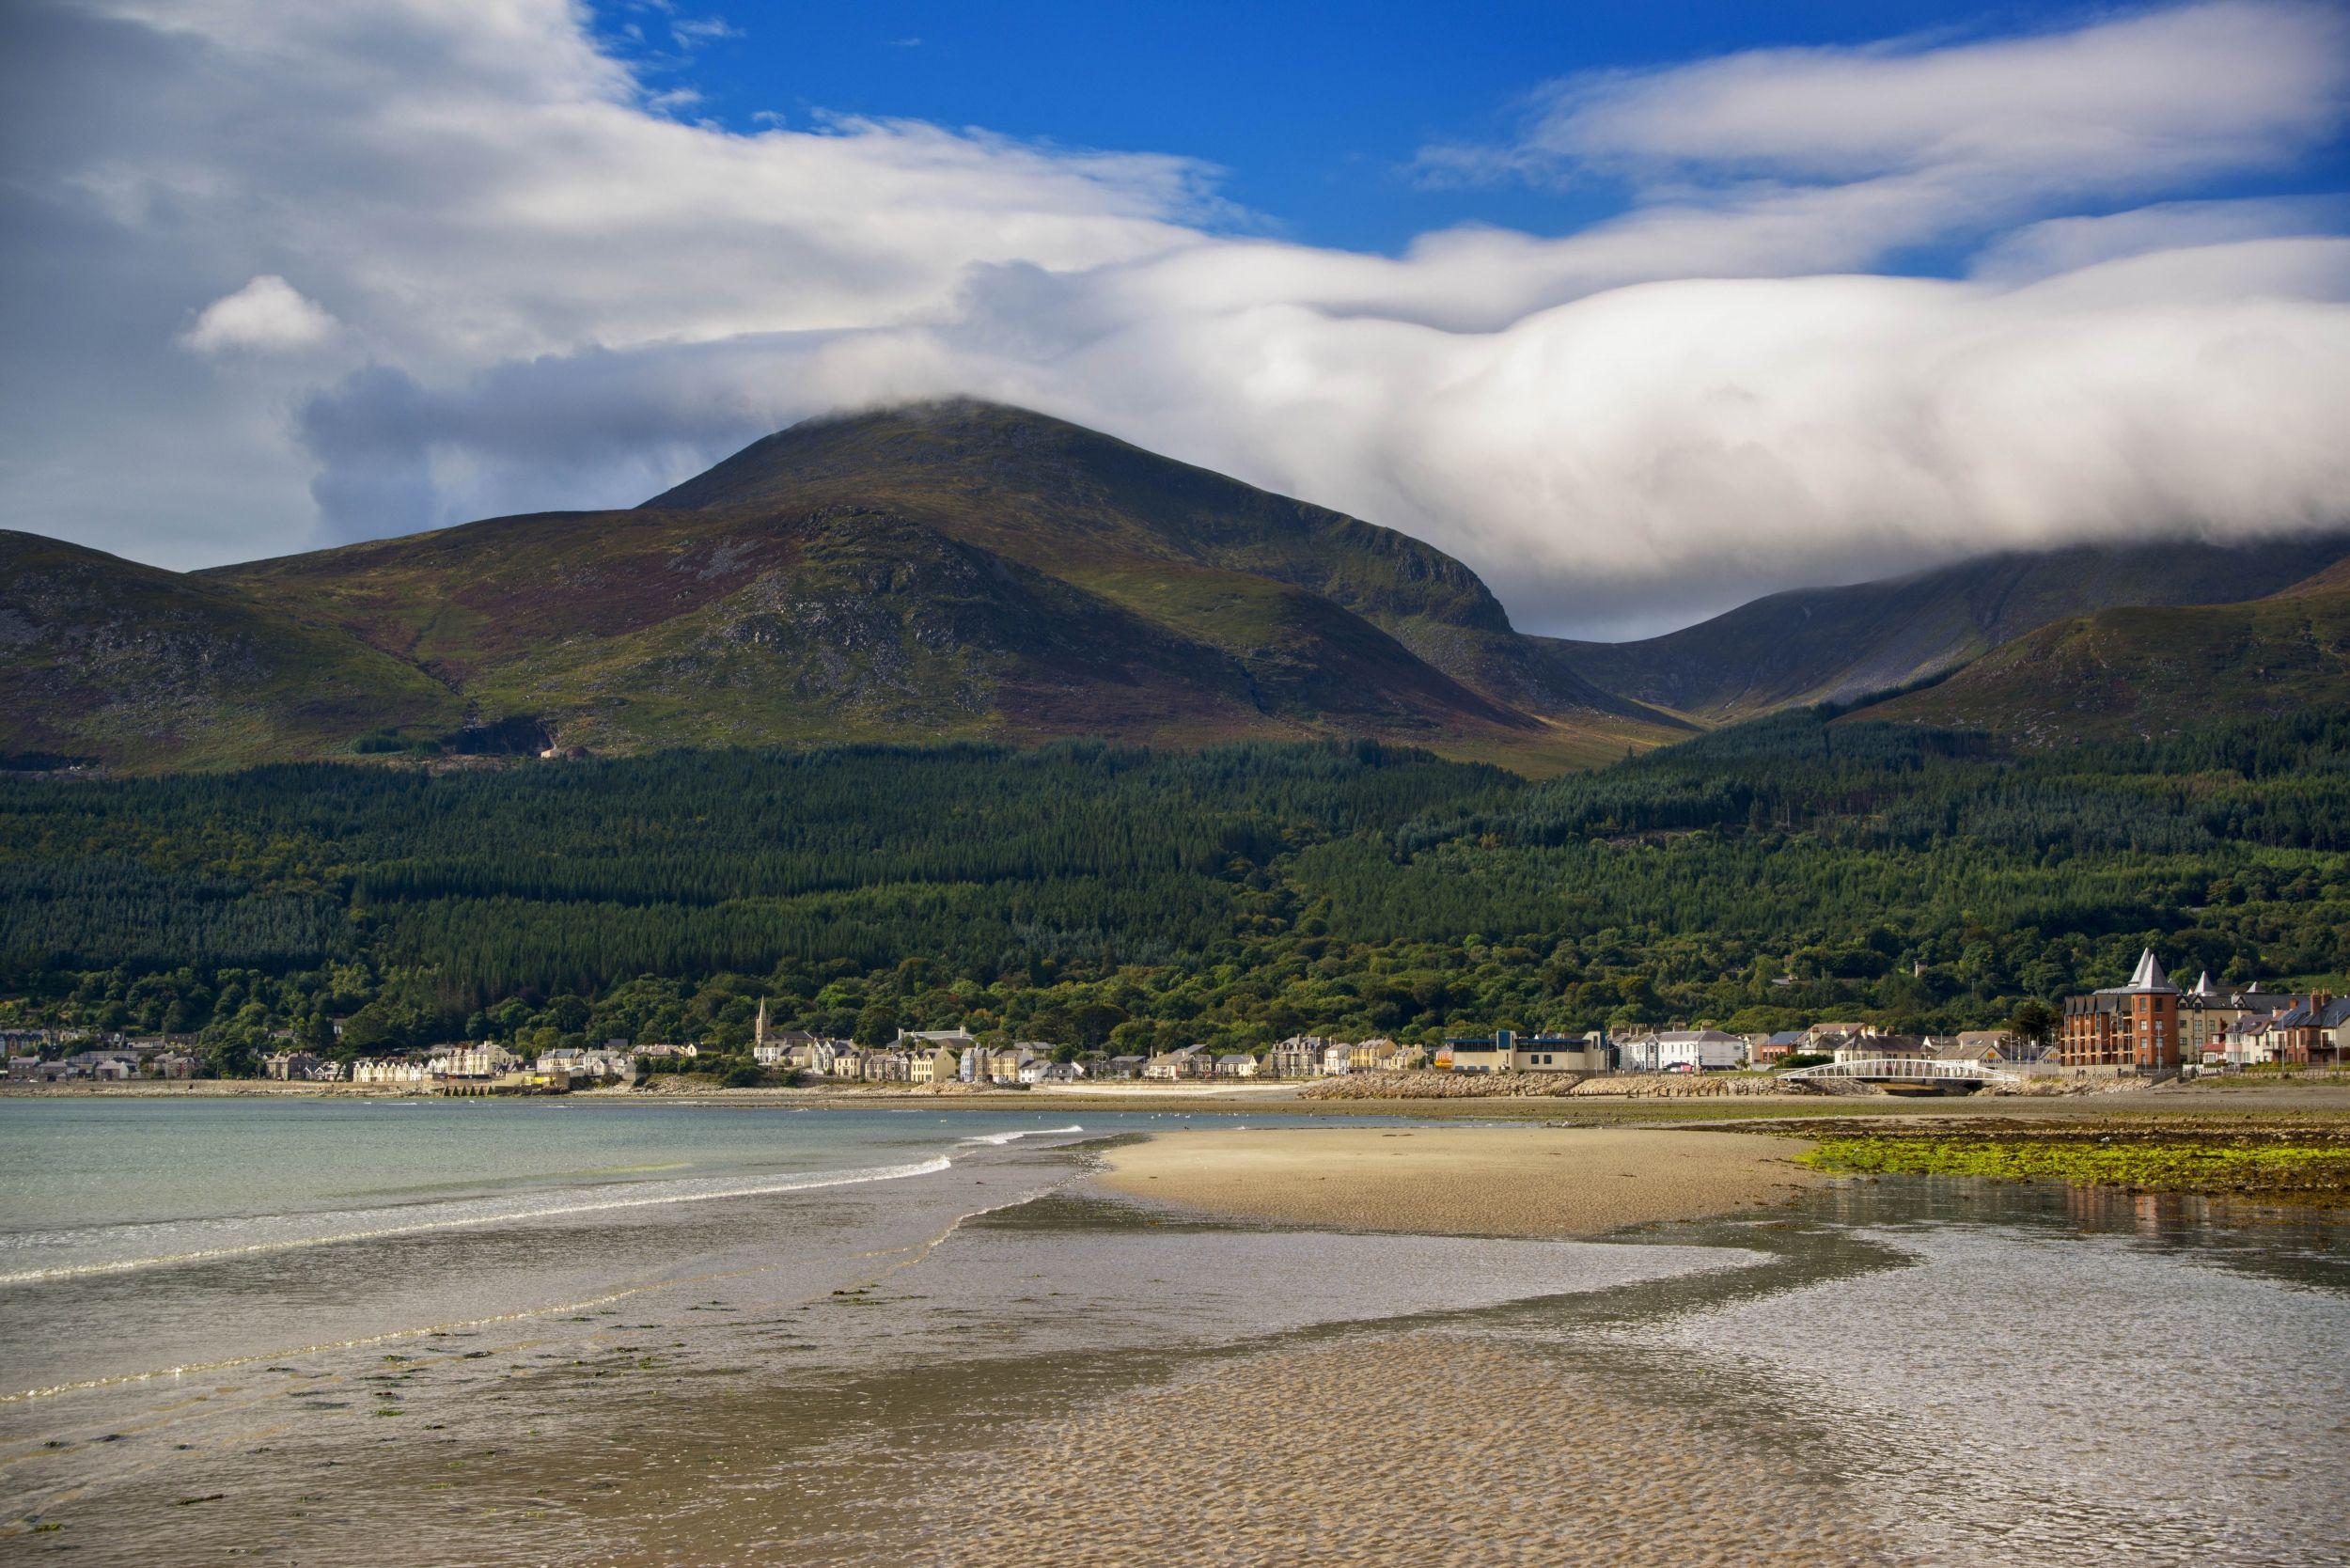 The Mourne Mountains With Images Ireland Tourism Northern Ireland Travel Irish Landscape